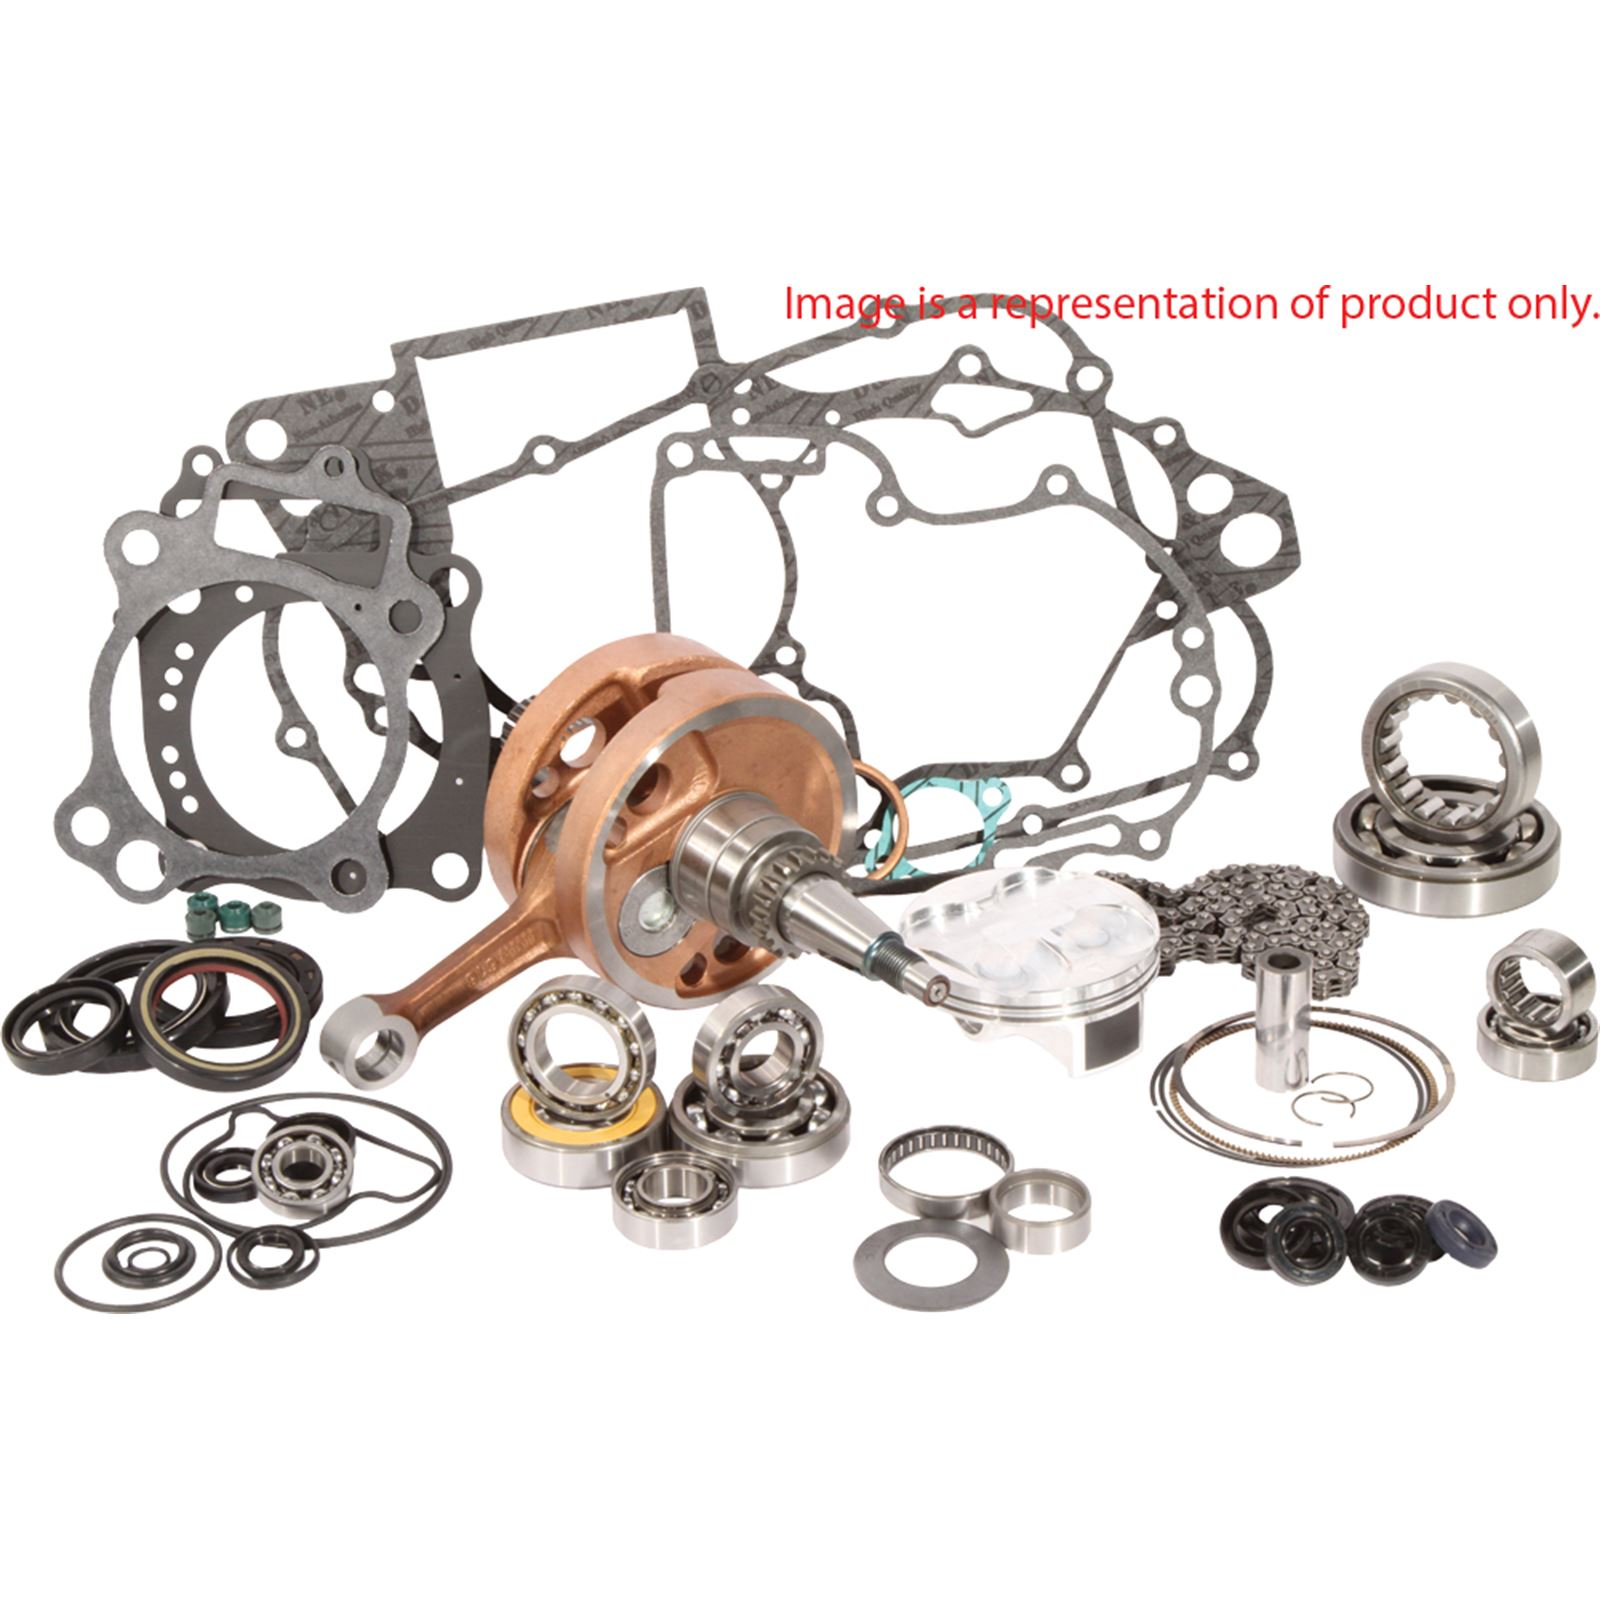 Wrench Rabbit Engine Rebuild Kit